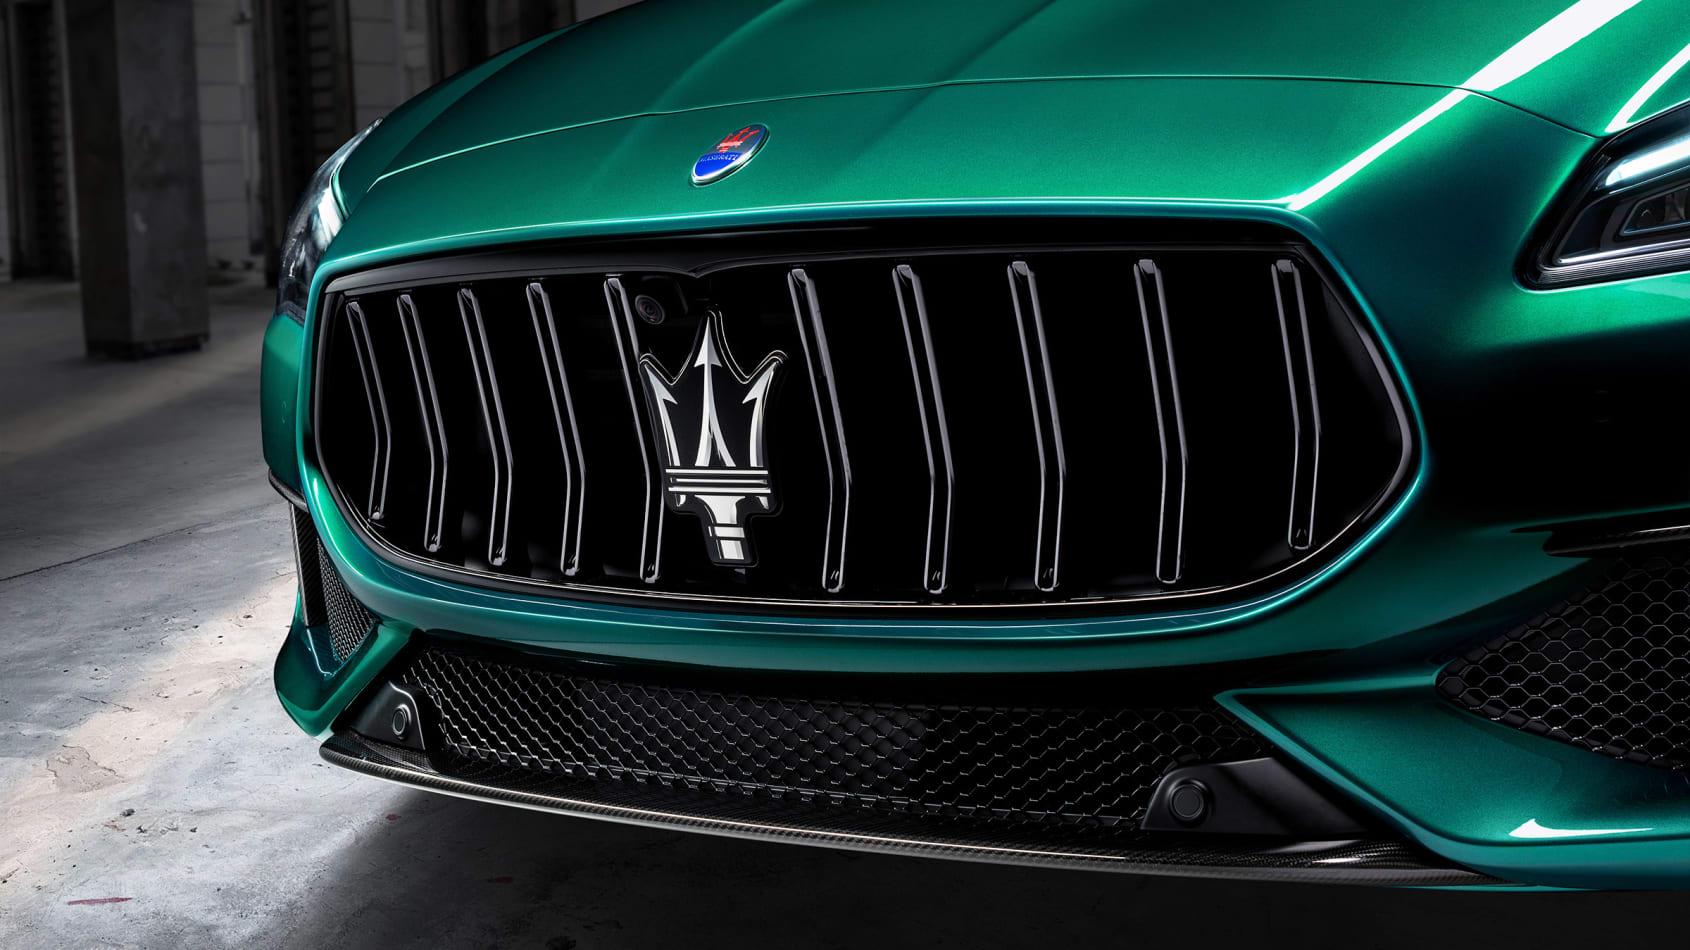 [Image: Maserati%20Quattroporte%20Trofeo-4.jpg]